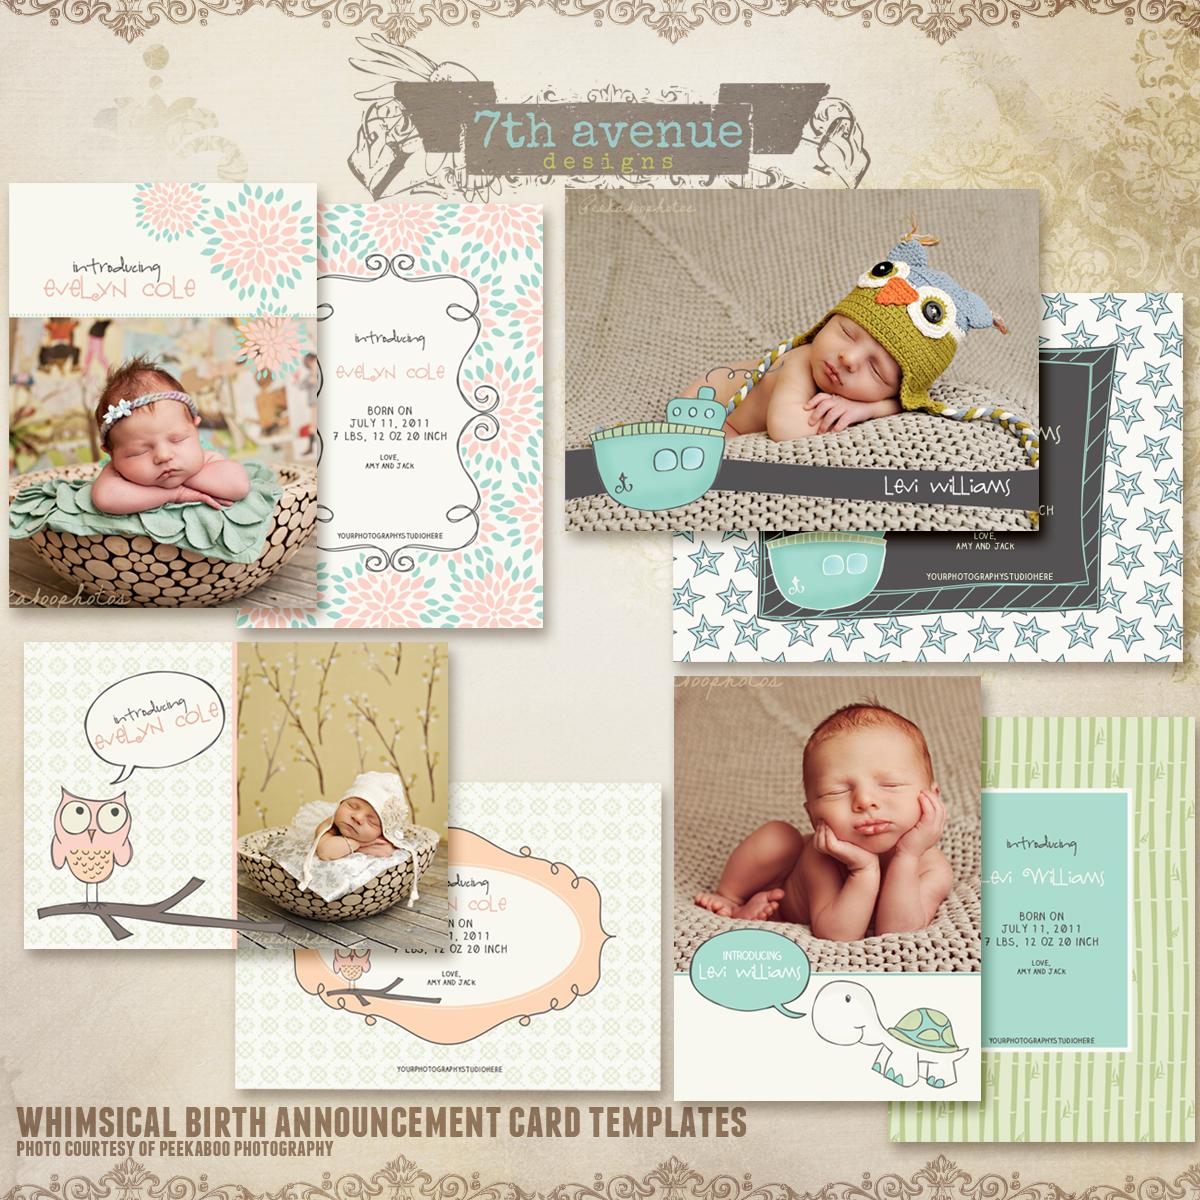 Whimsical Birth Announcement Card Templates cardswhimsicalbac – Baby Announcement Card Templates